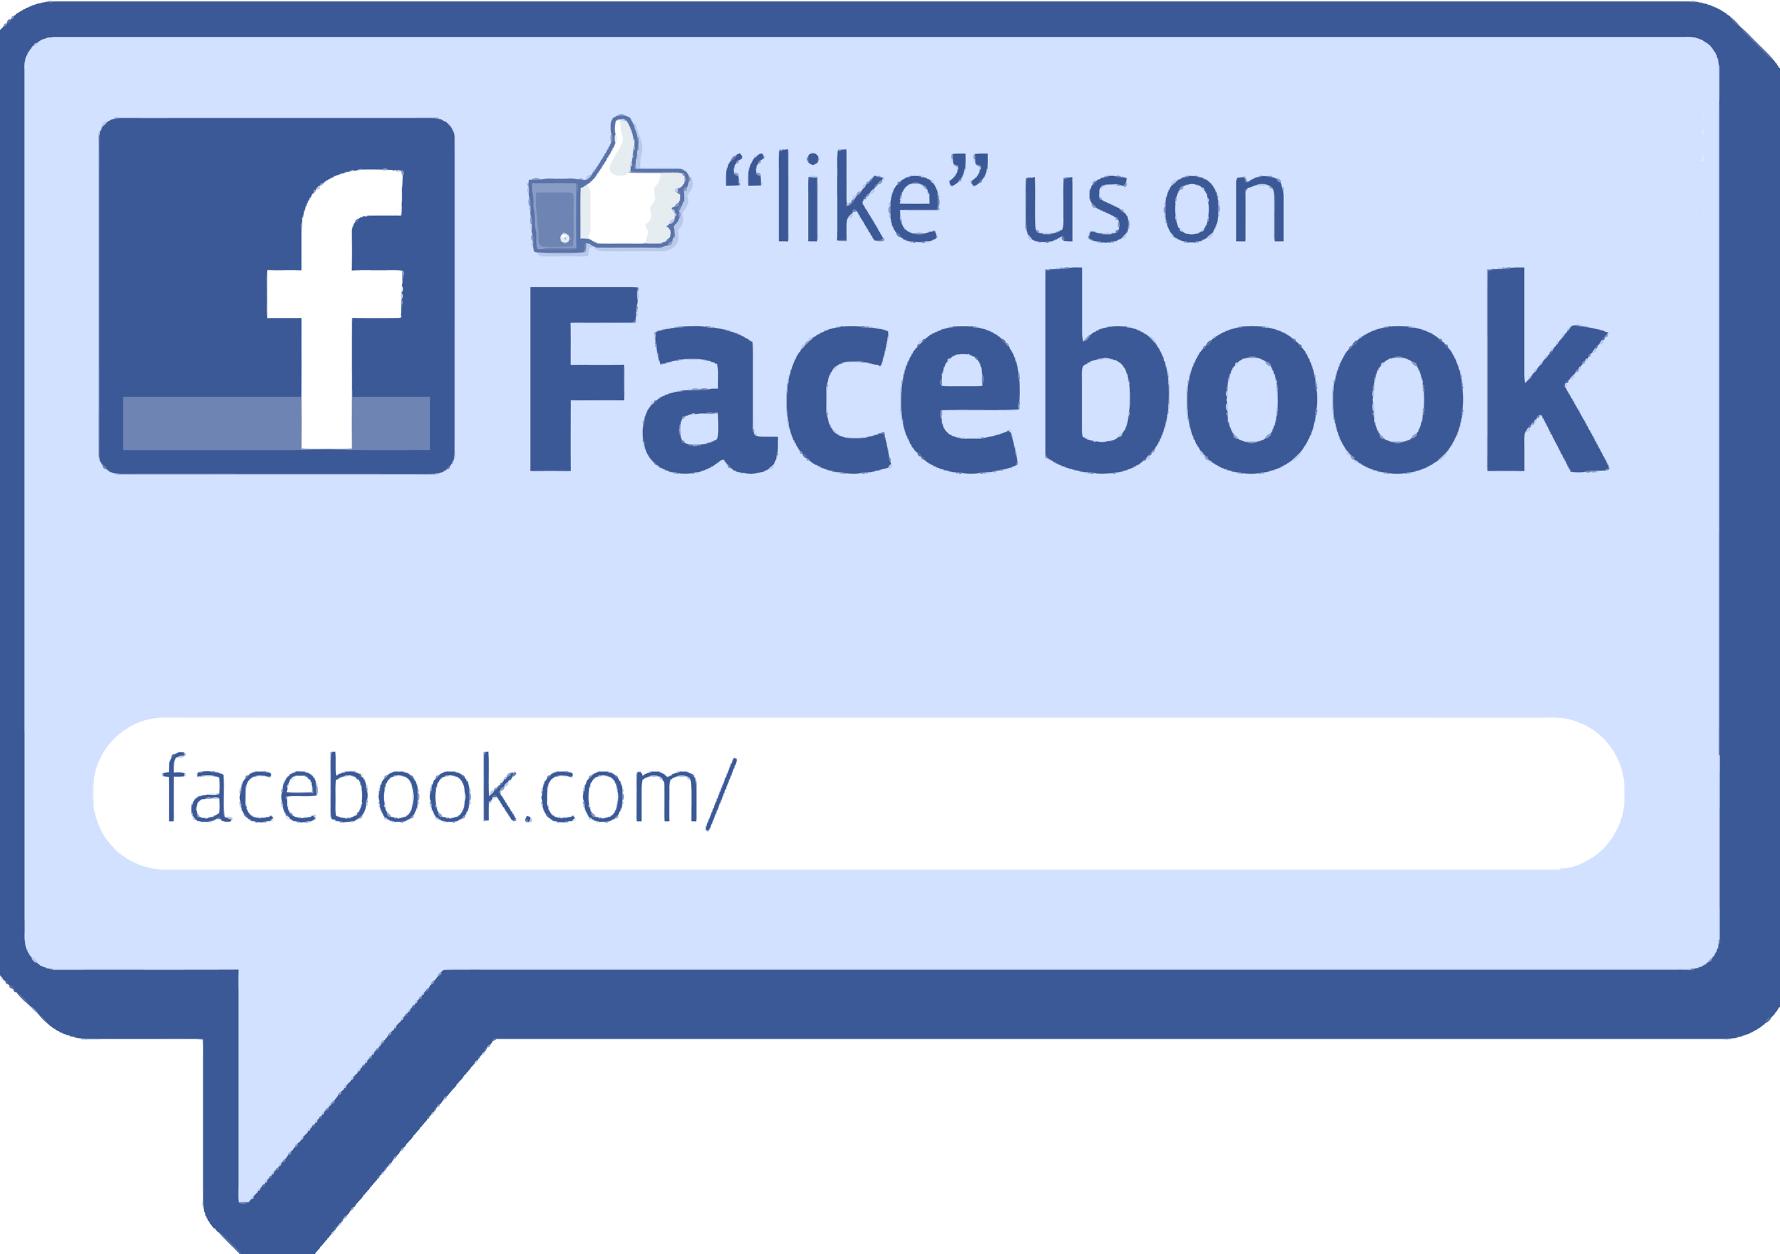 Facebook promo hotel bristol clip art